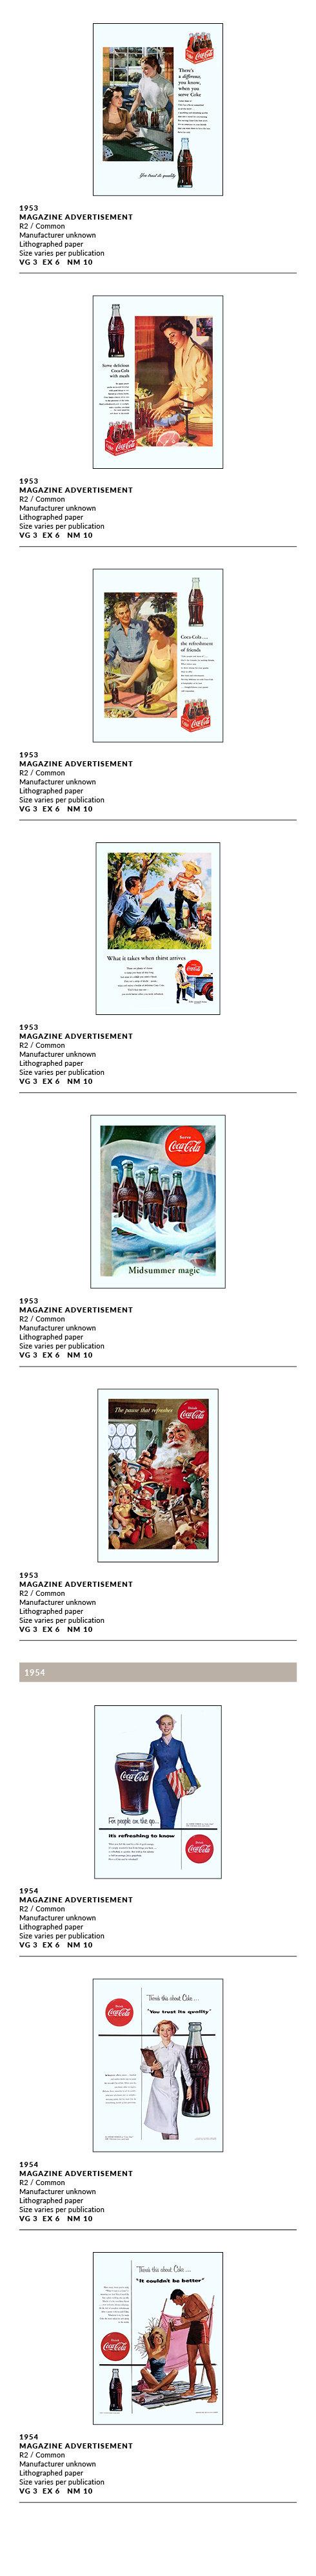 1950-54 Ads8.jpg